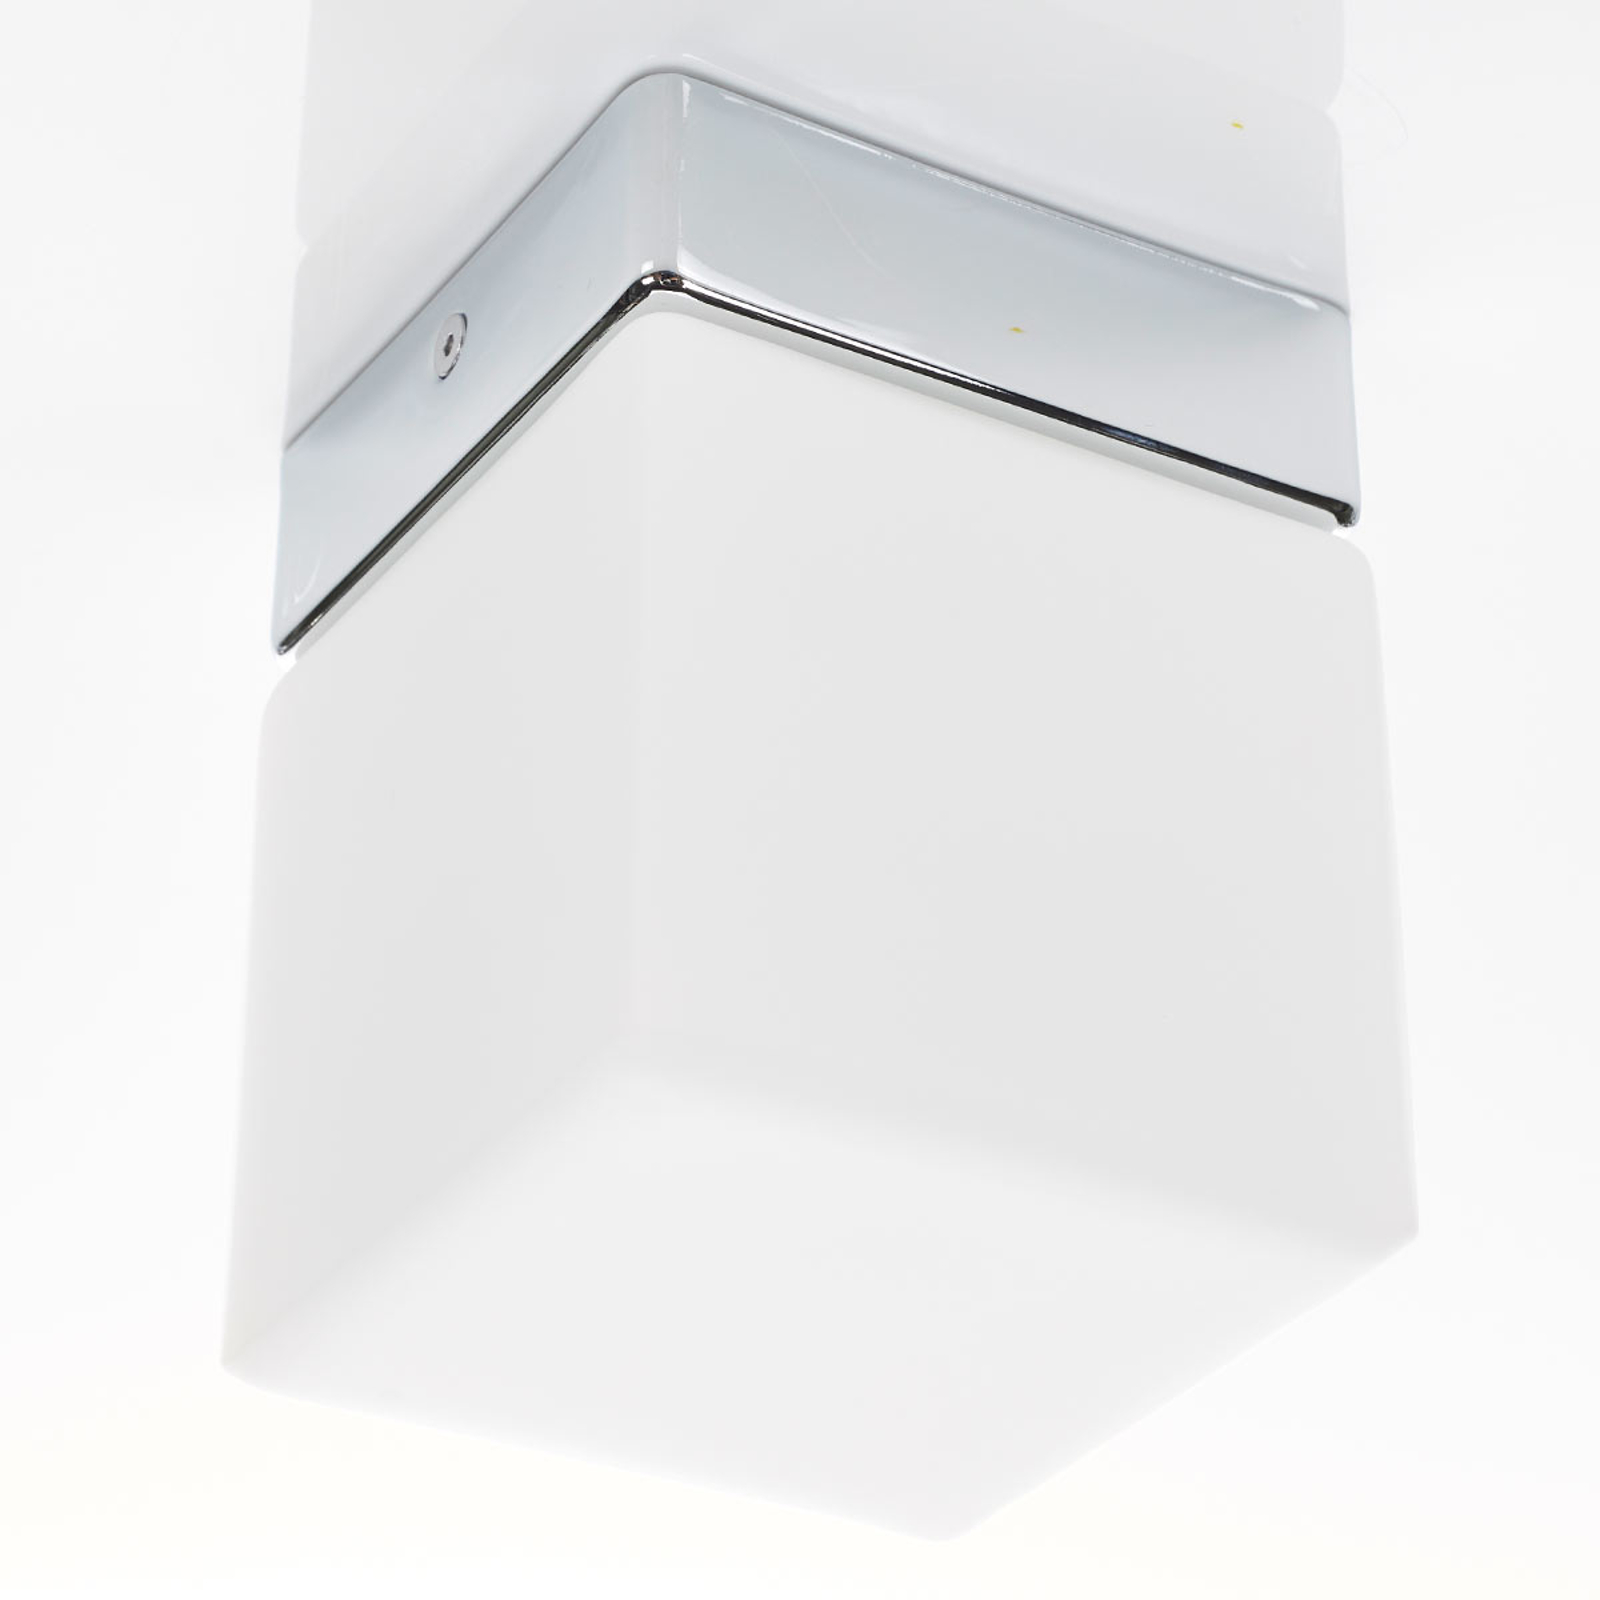 Helestra Keto - LED-Bad-Deckenleuchte, Würfel